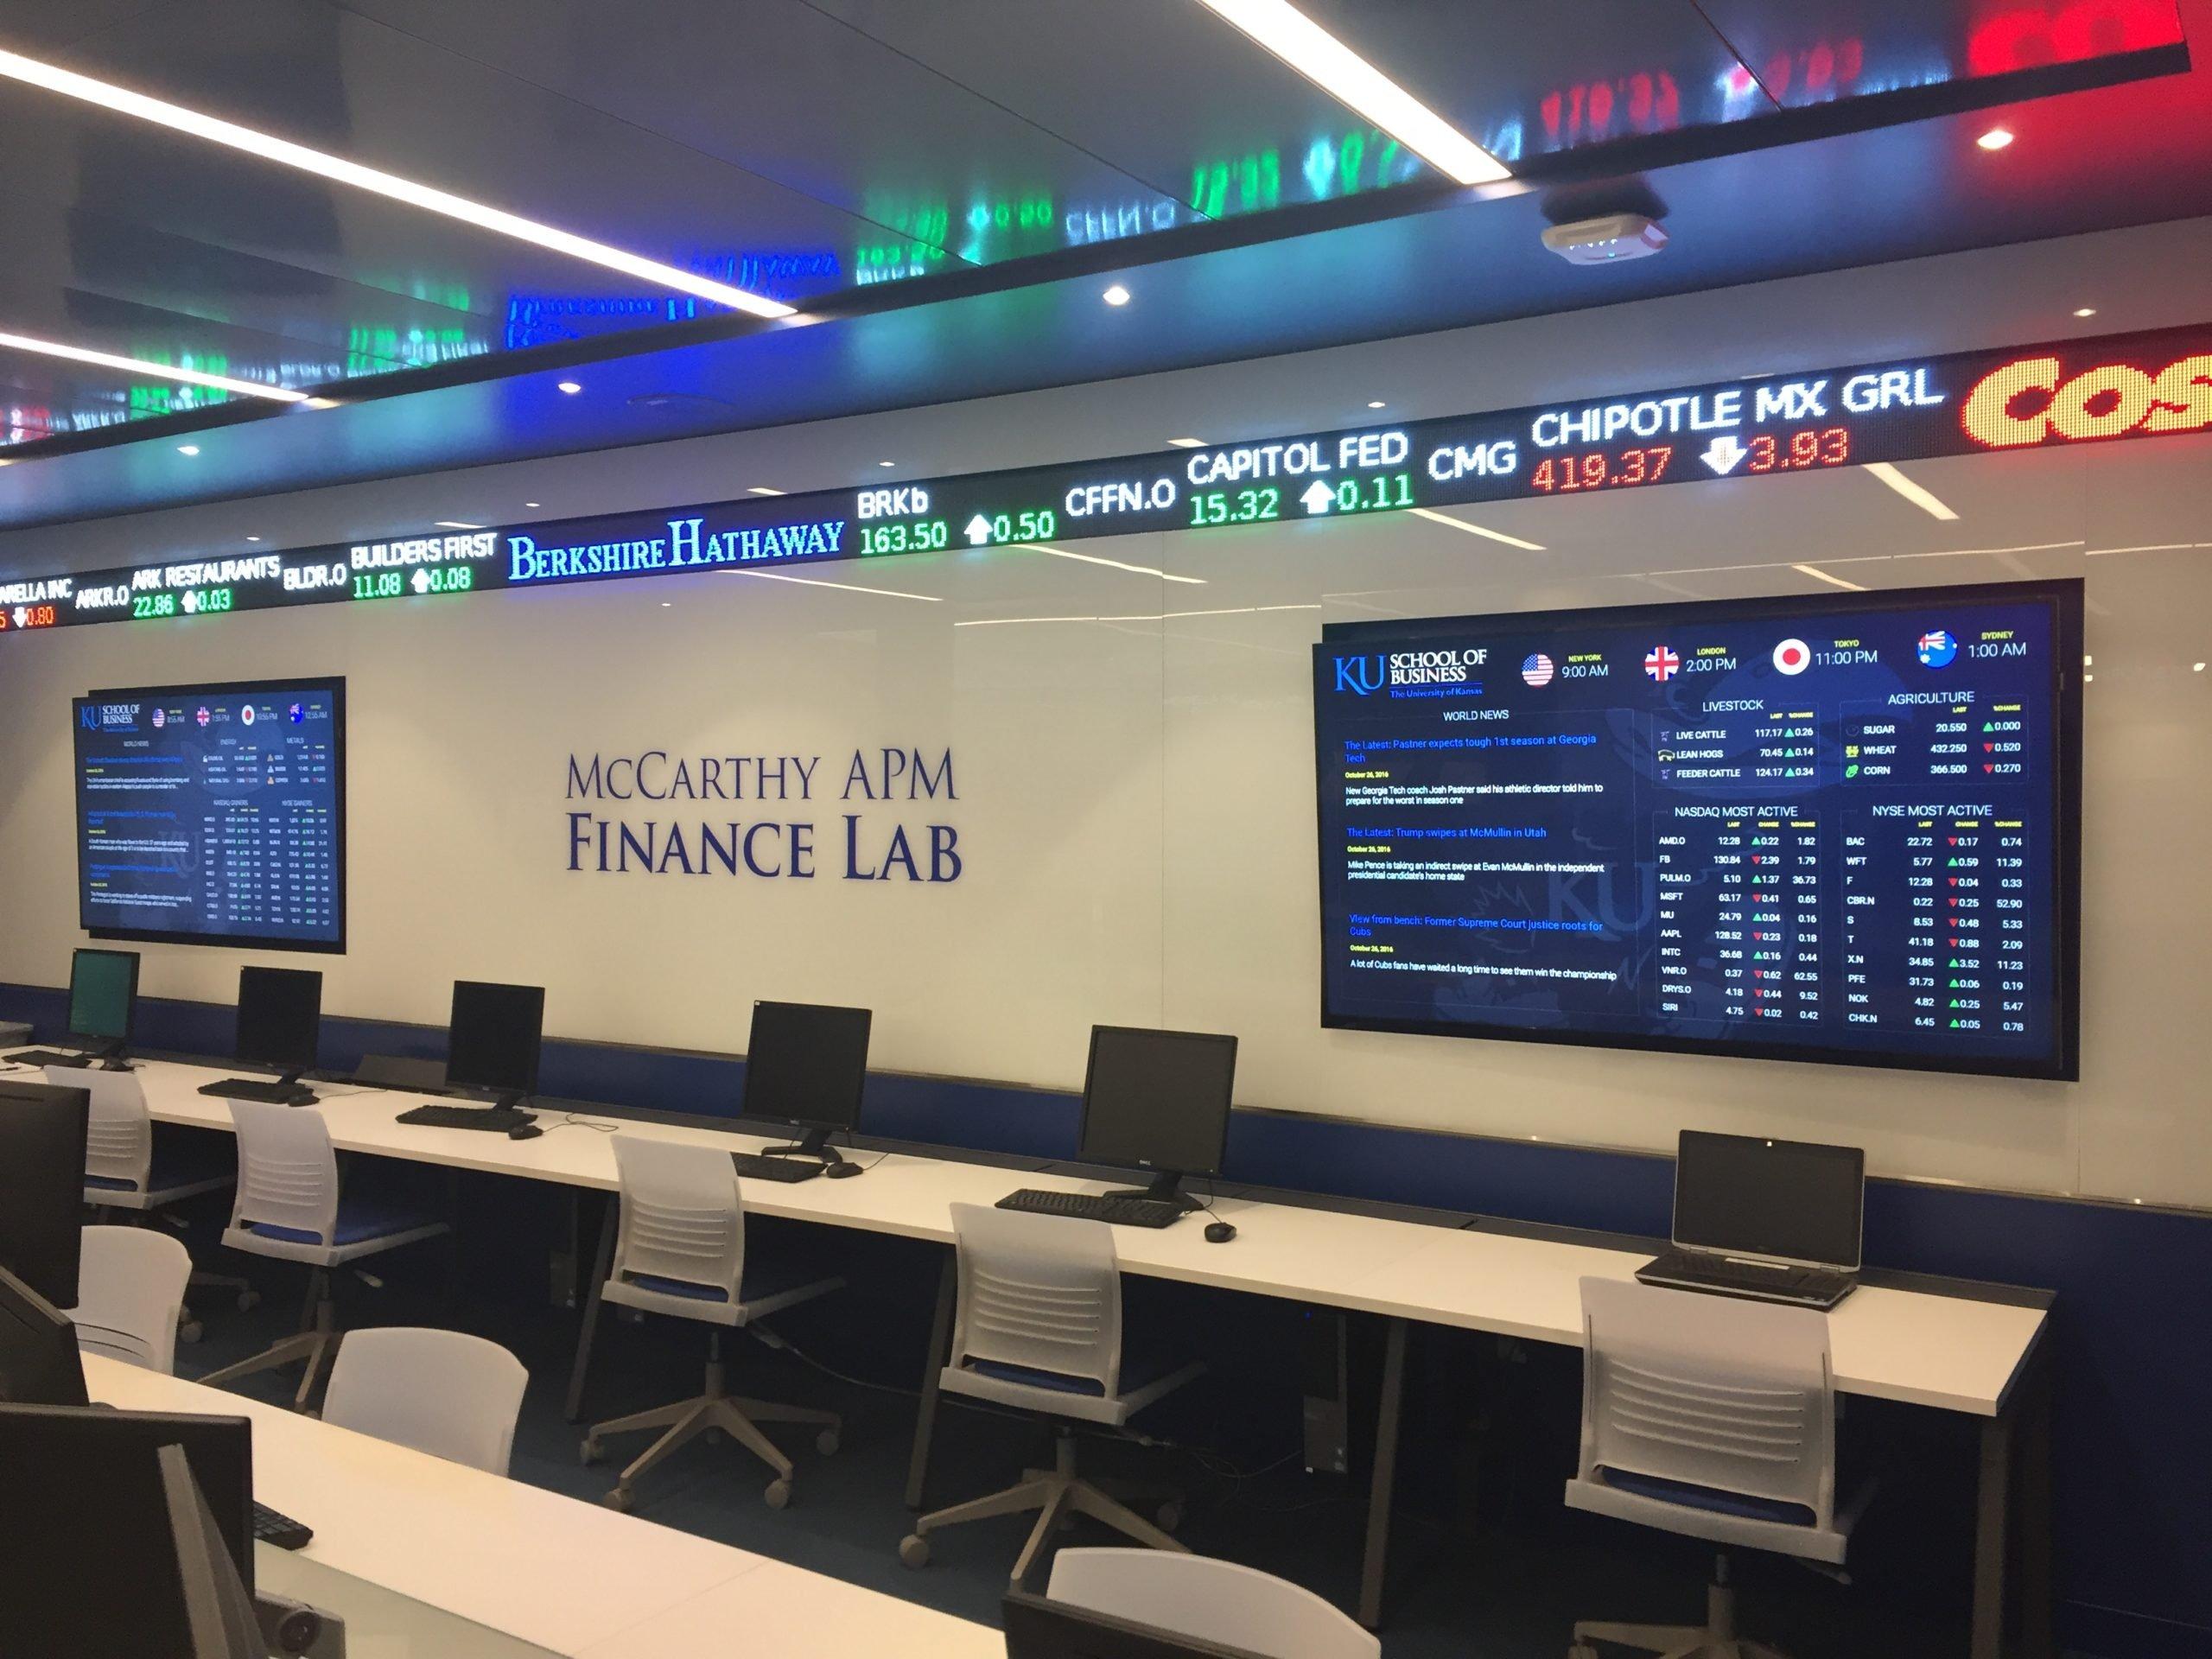 University of Kansas finance lab digital signage